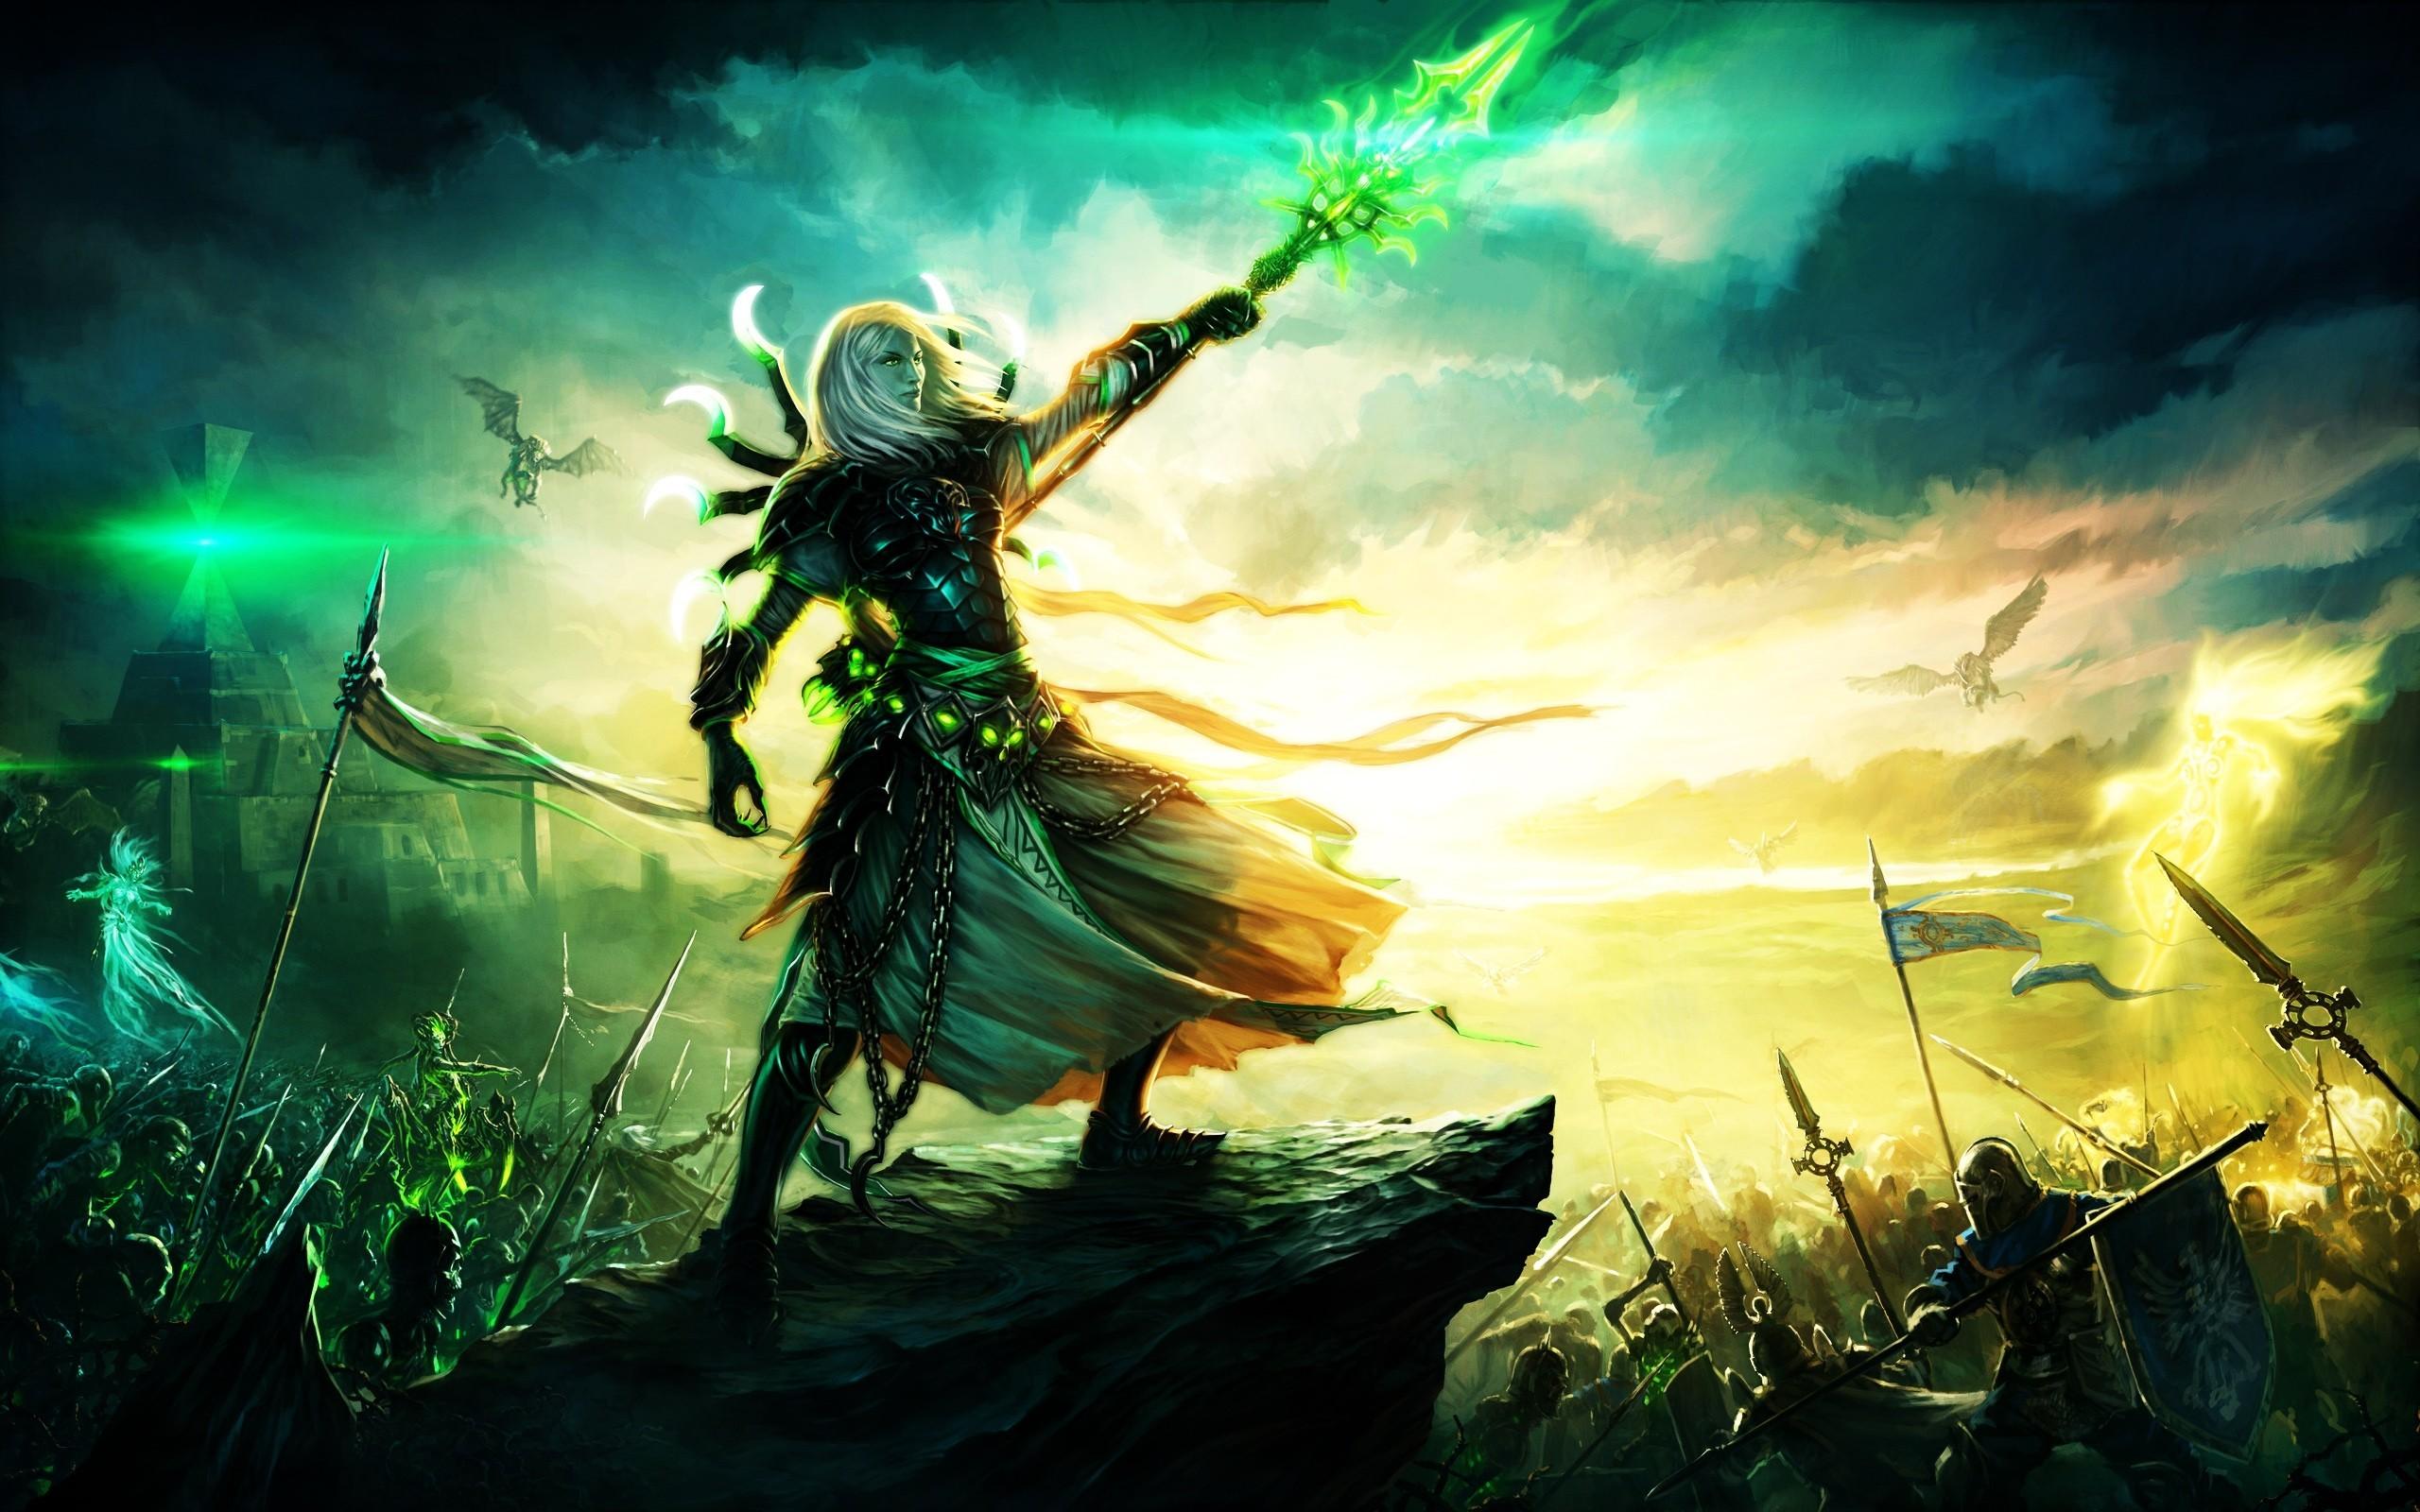 Epic Fantasy War Wallpaper ·①